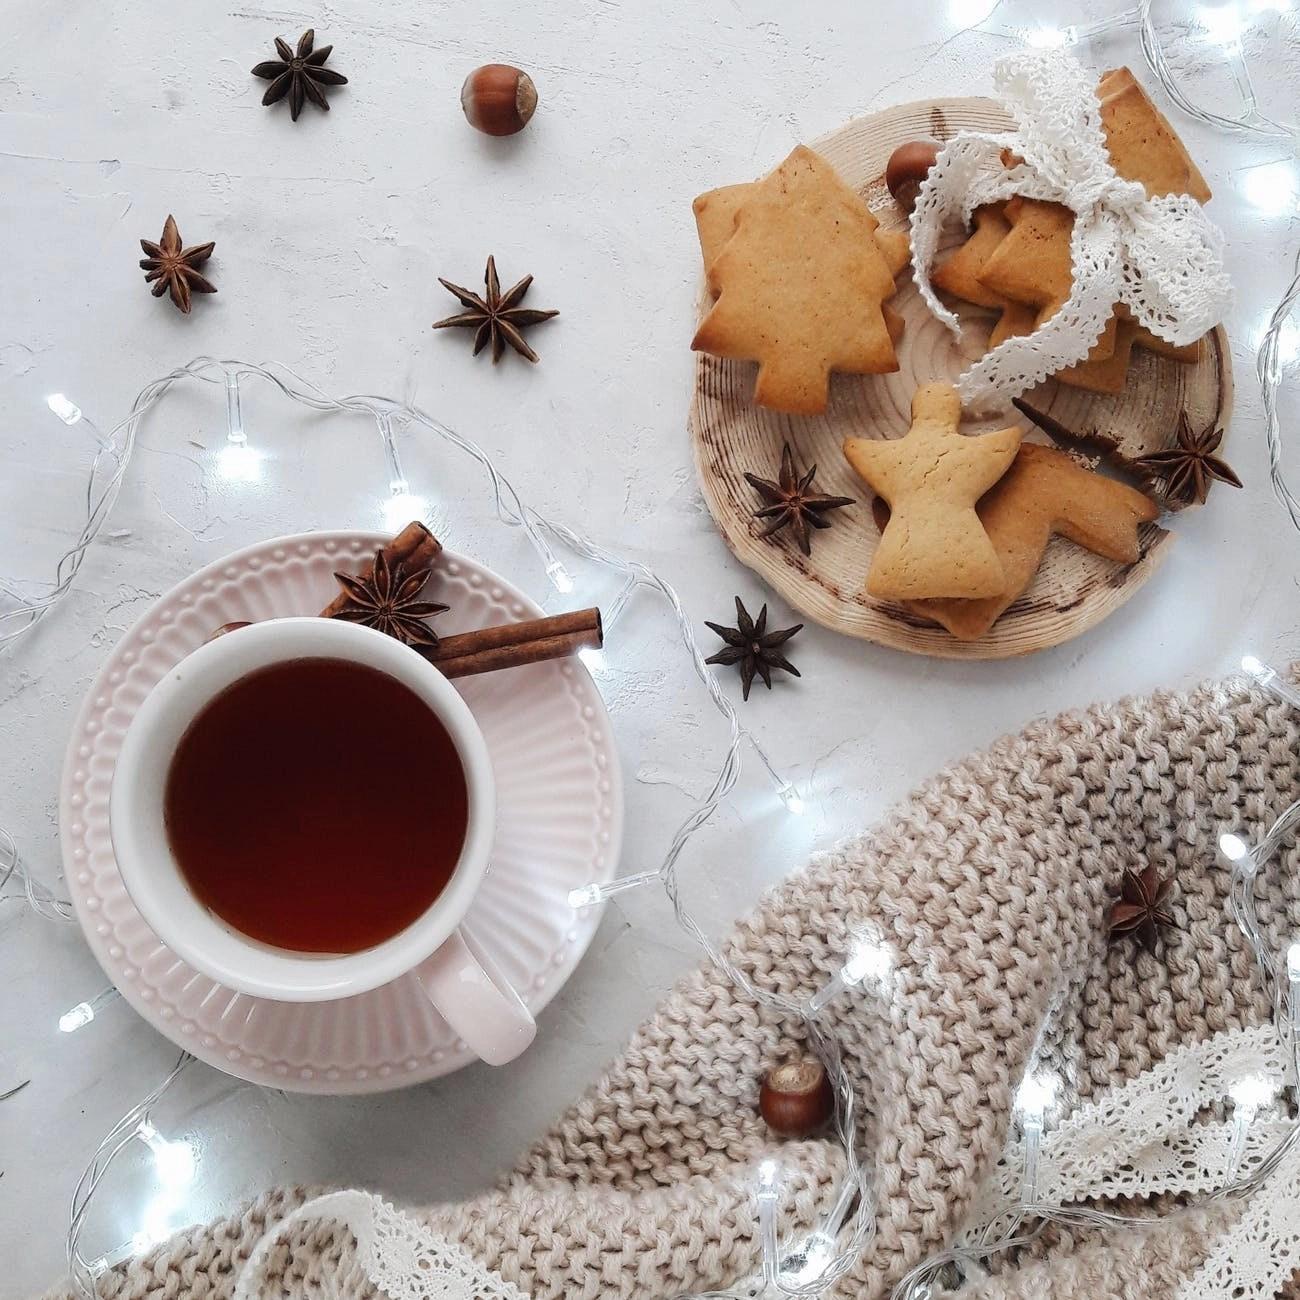 photo of white ceramic mug near cookies